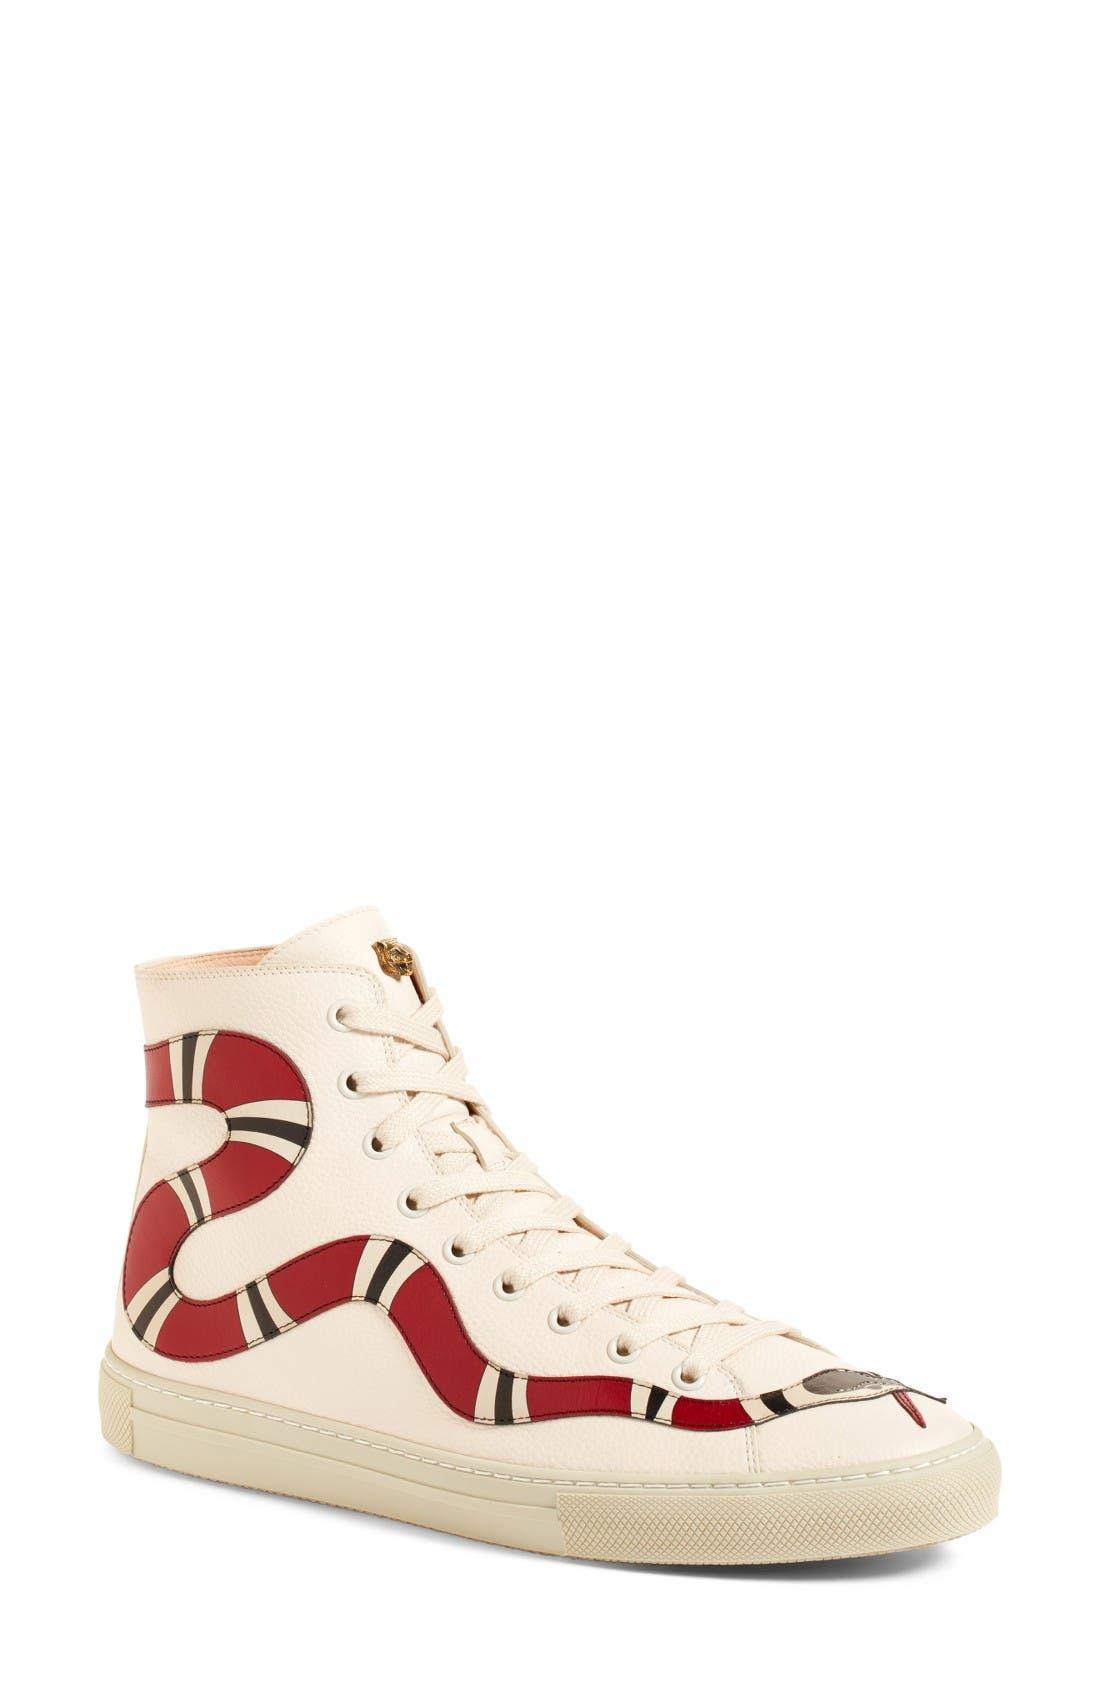 Alternate Image 1 Selected - Gucci Major Snake High Top Sneaker (Women)